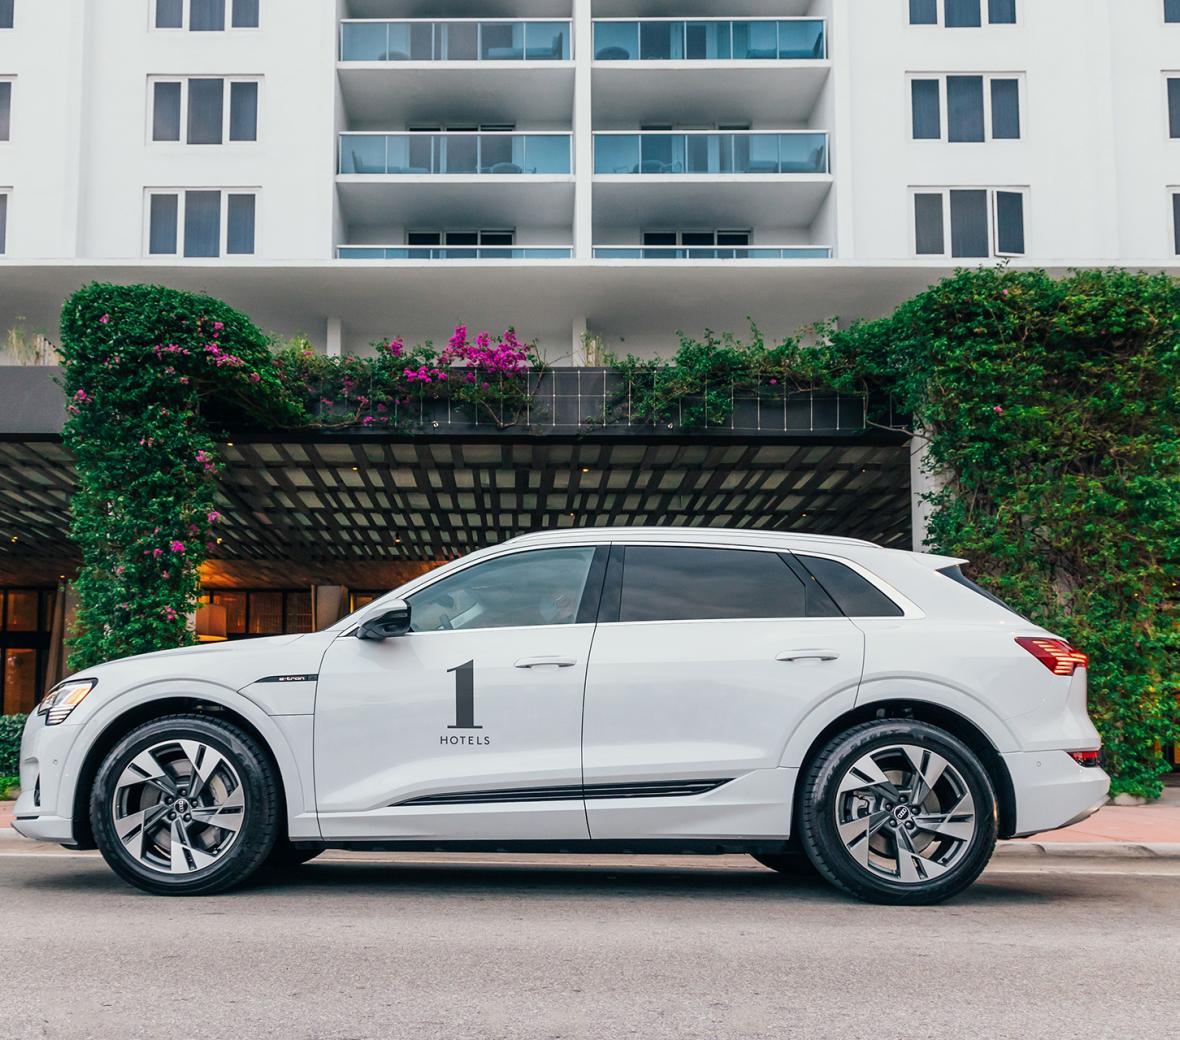 Audi e-tron at 1 Hotel South Beach